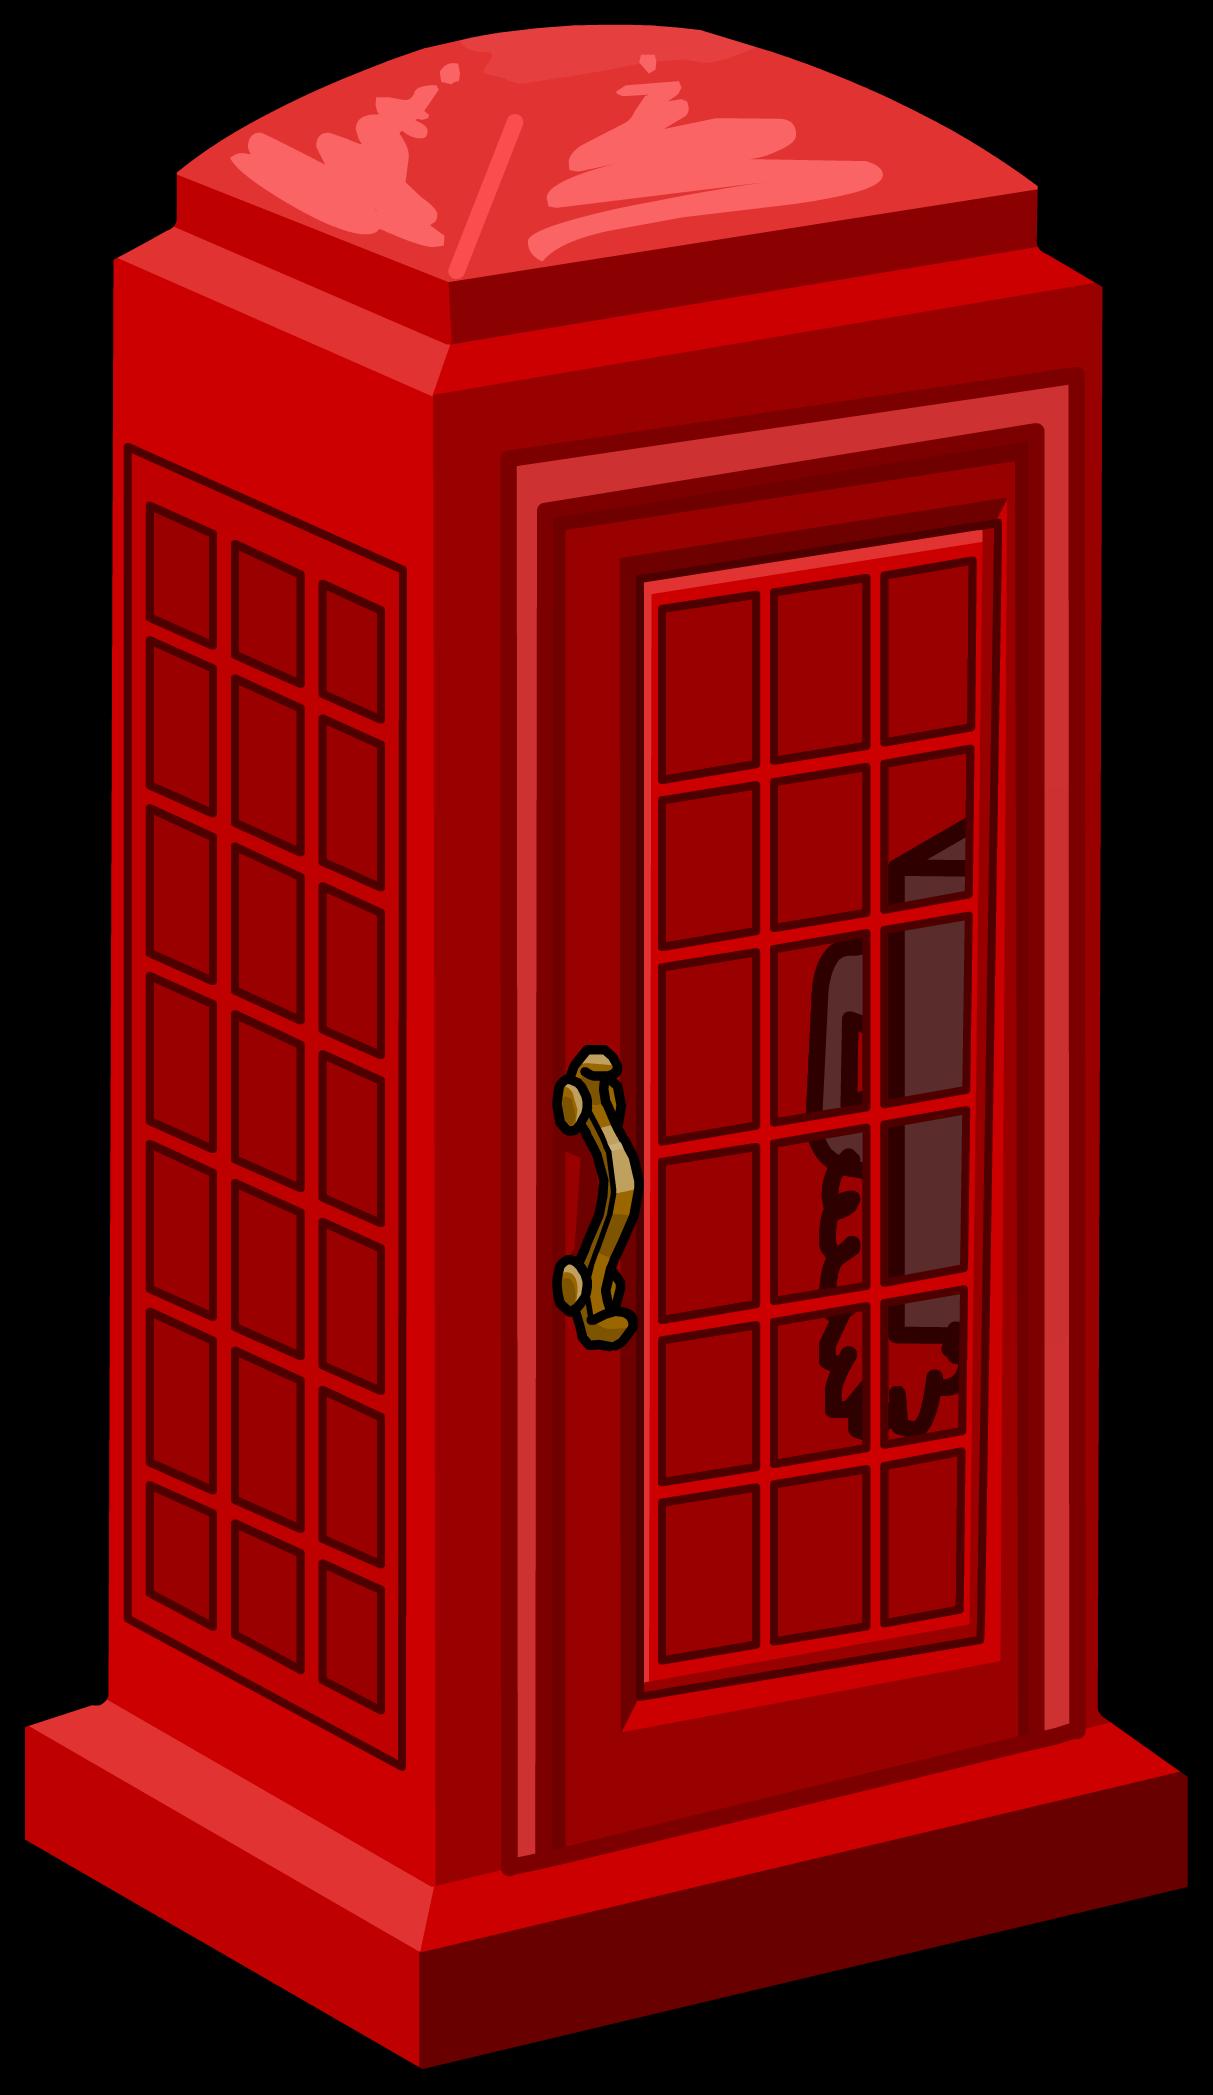 Phone Booth Png Image Phone Booth Phone Png Images